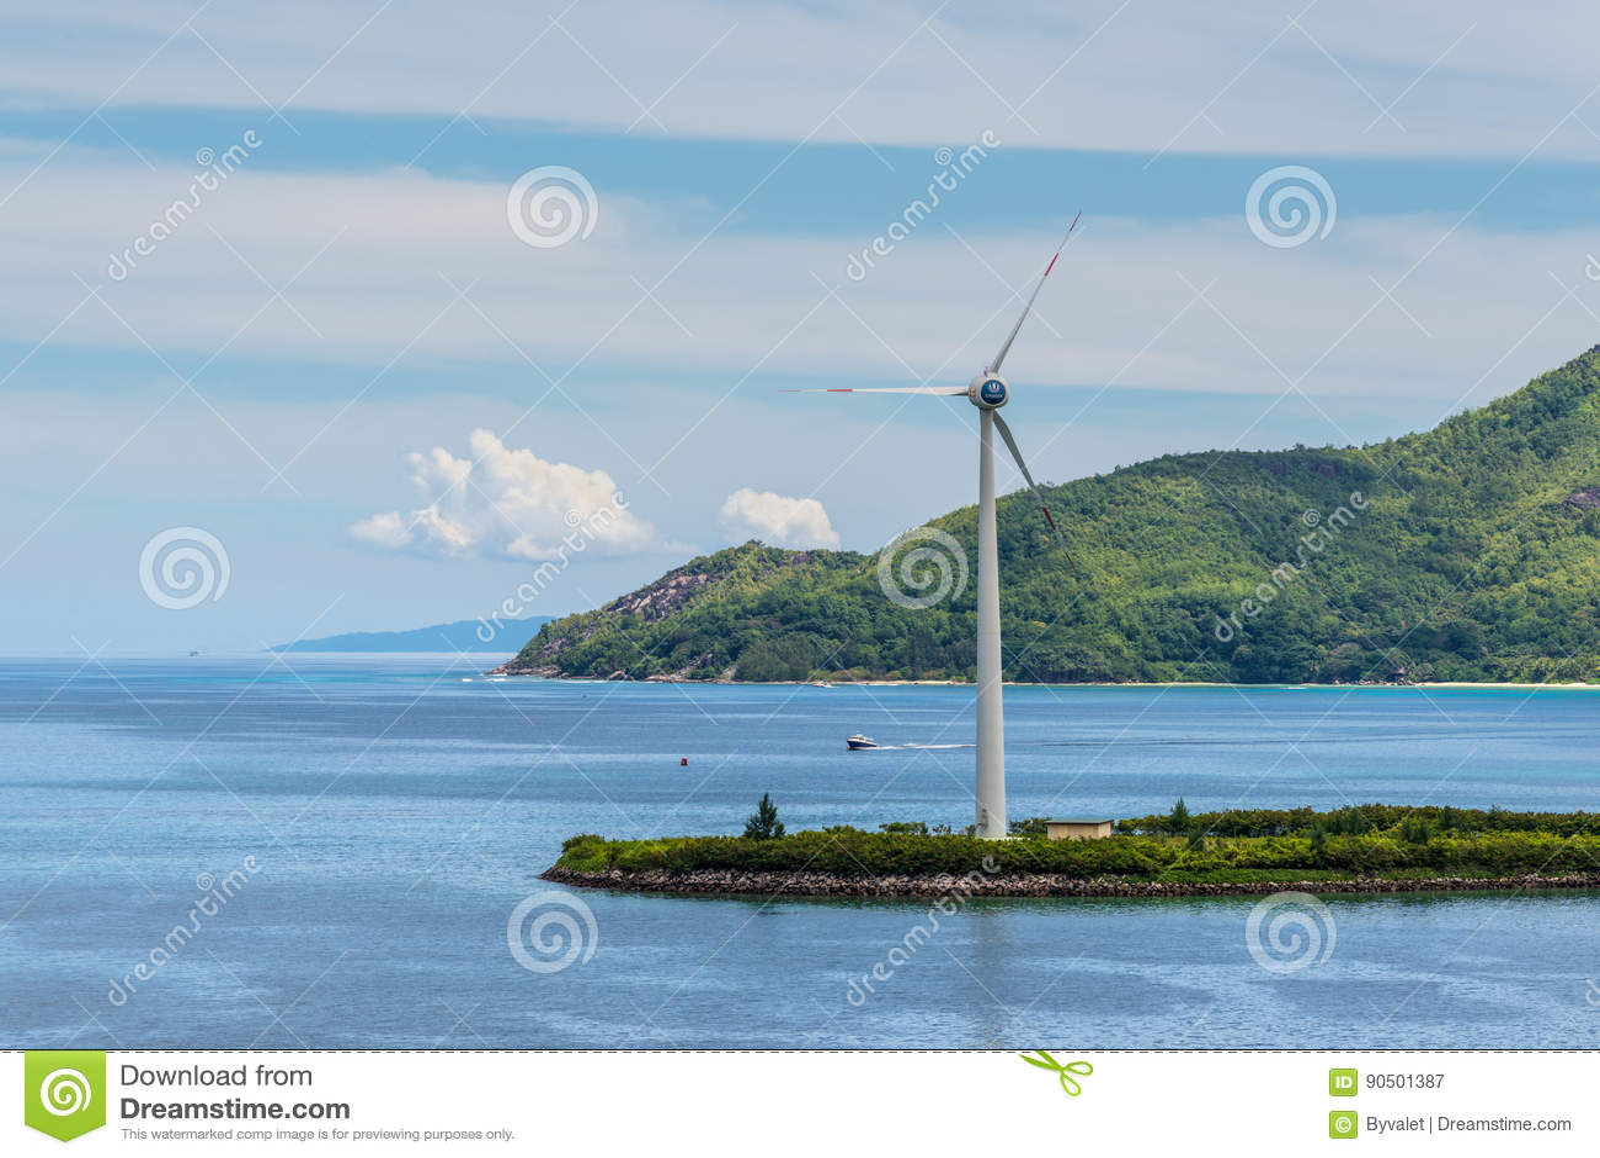 Wind Turbine Producing Alternative Energy Editorial